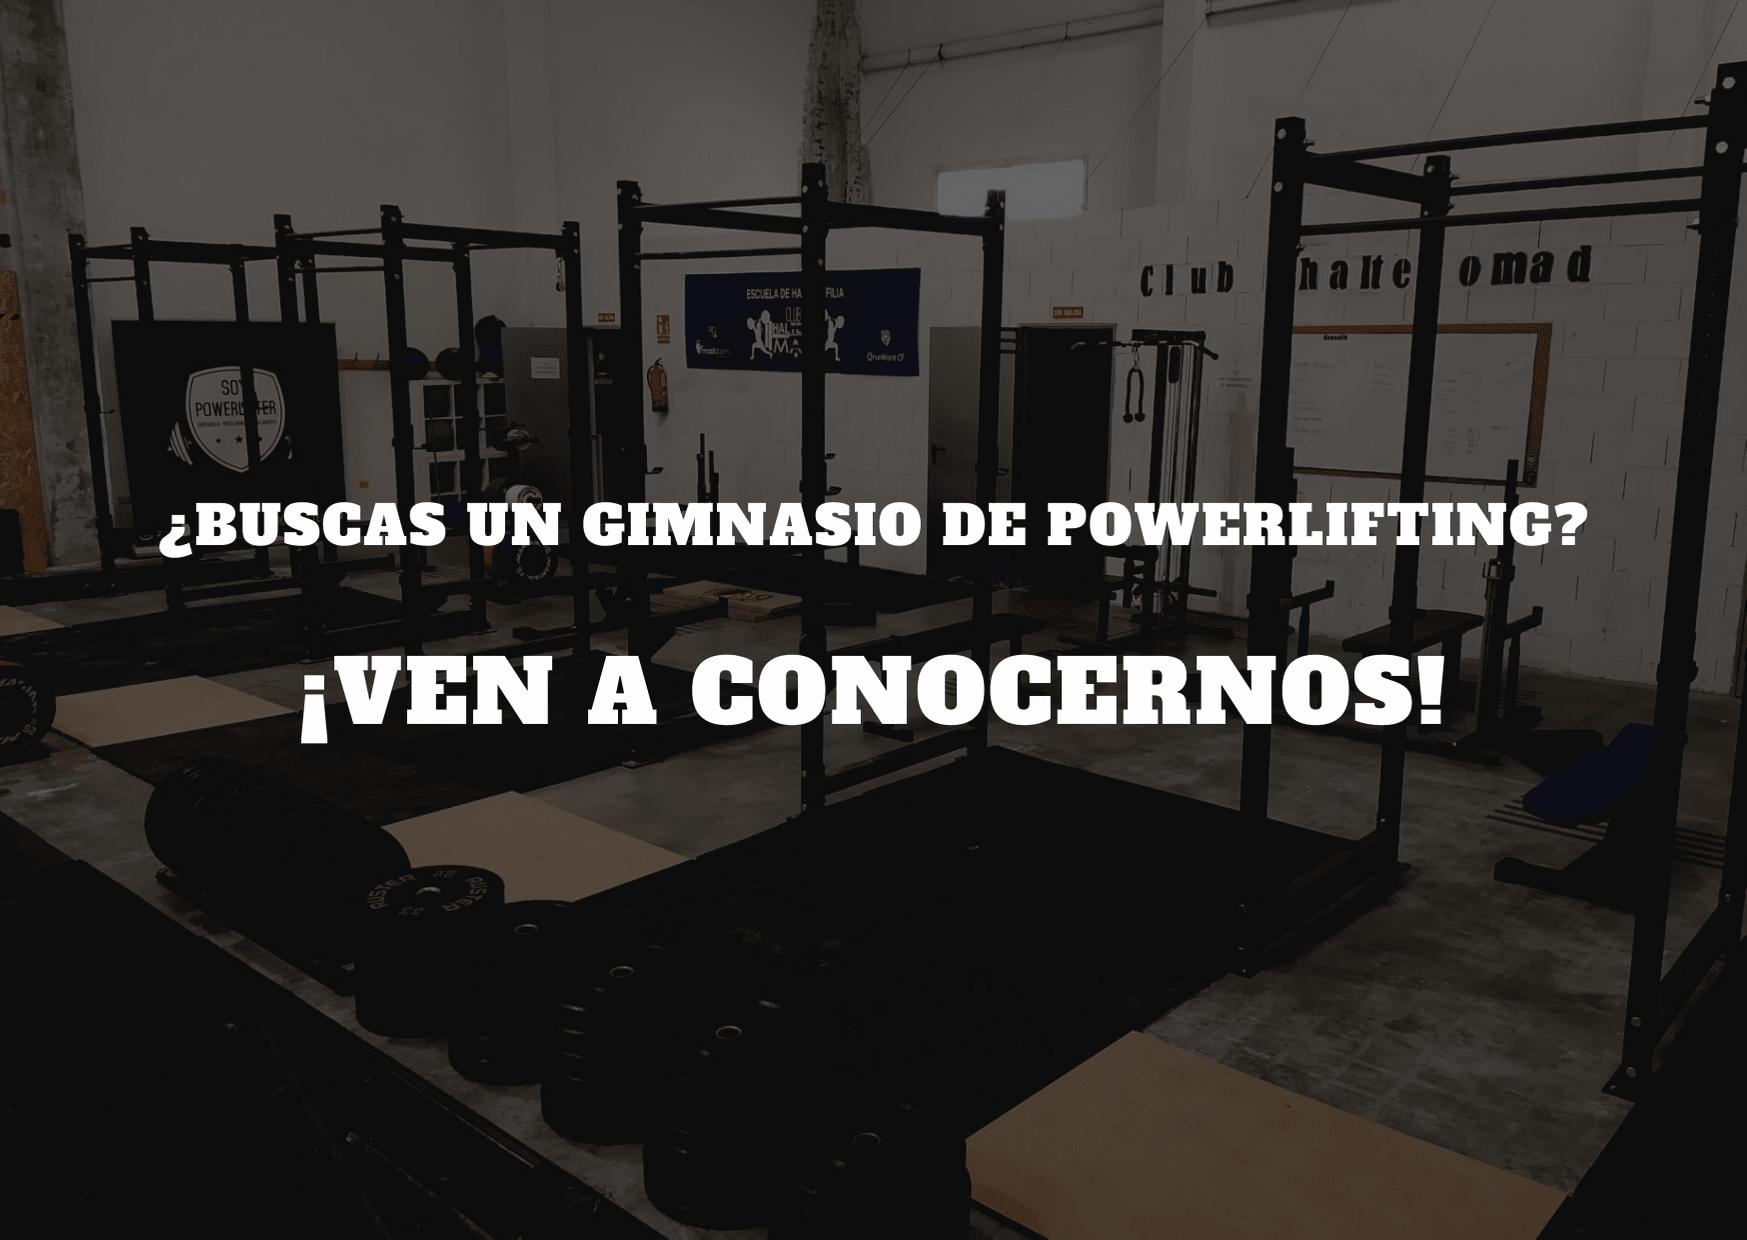 gimnasio de powerlifting